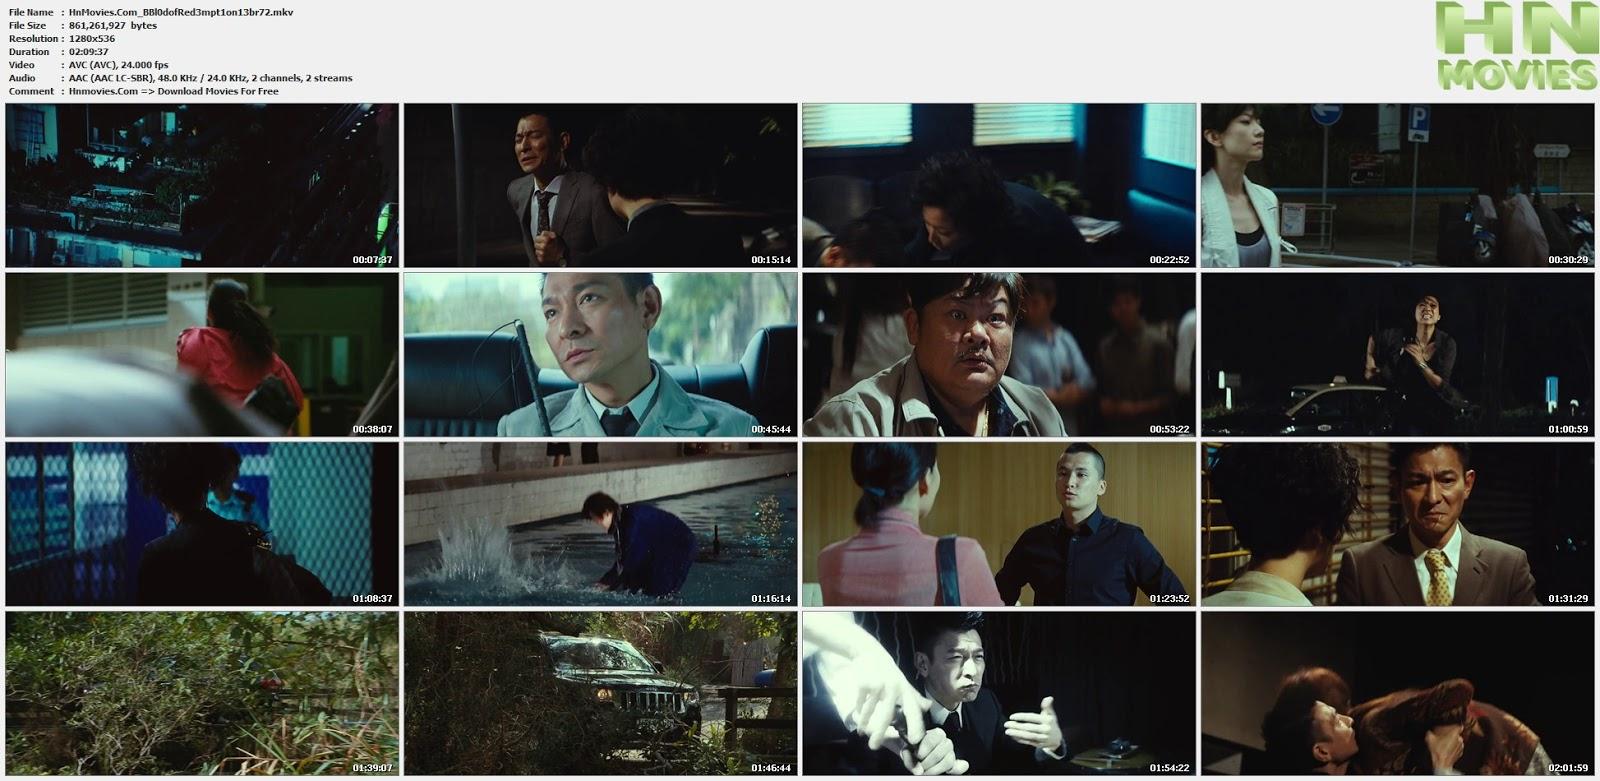 movie screenshot of Blind Detective fdmovie.com